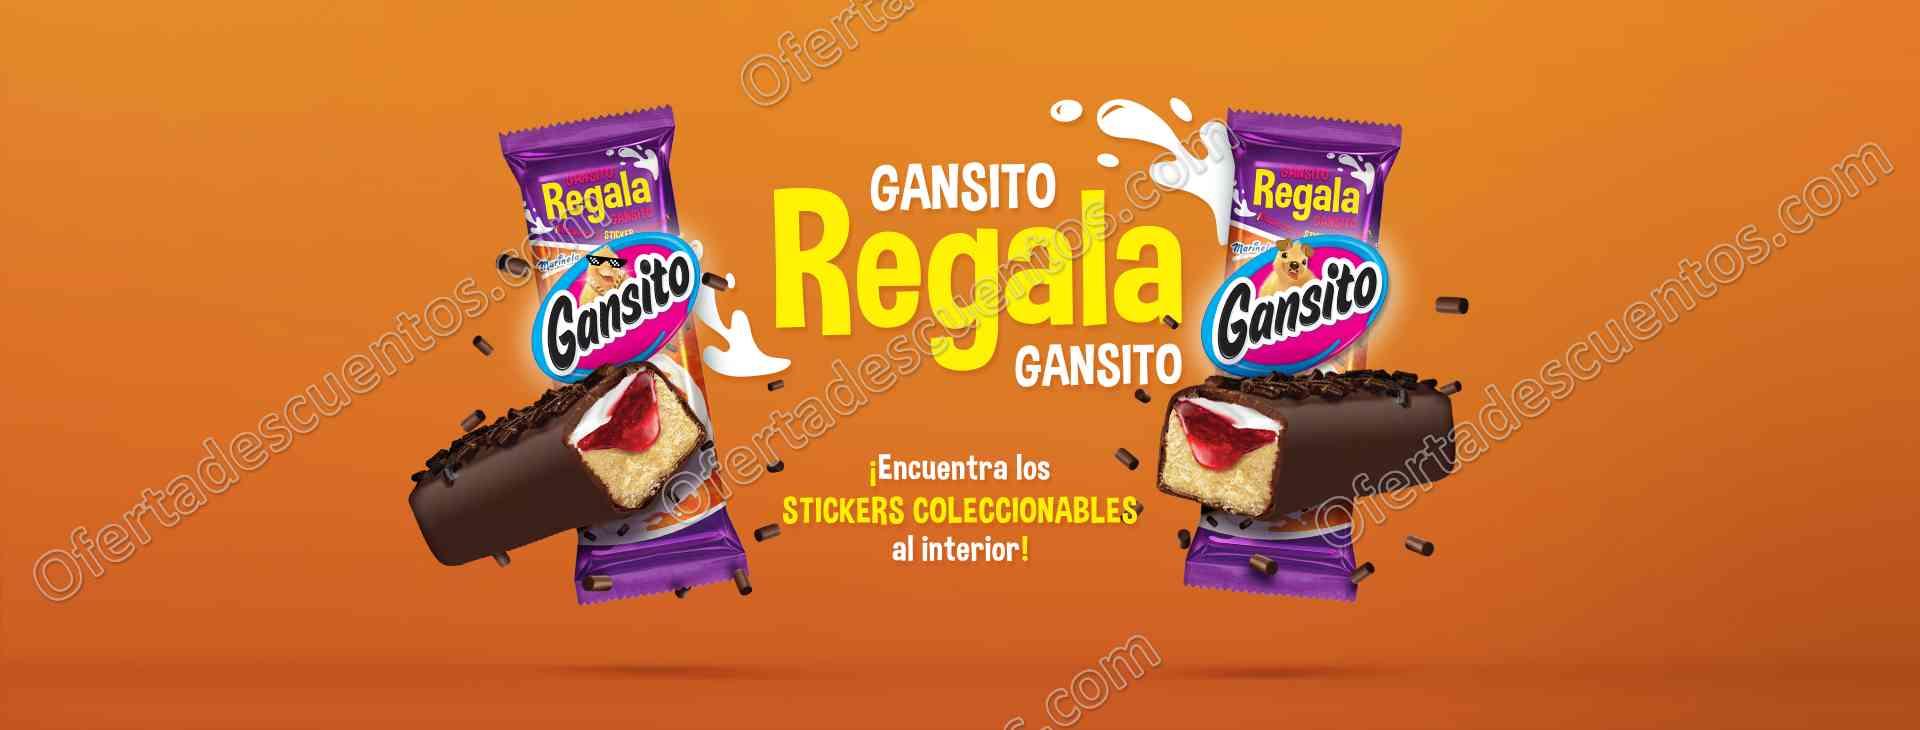 Promocion Gansito regala Gansito 2018